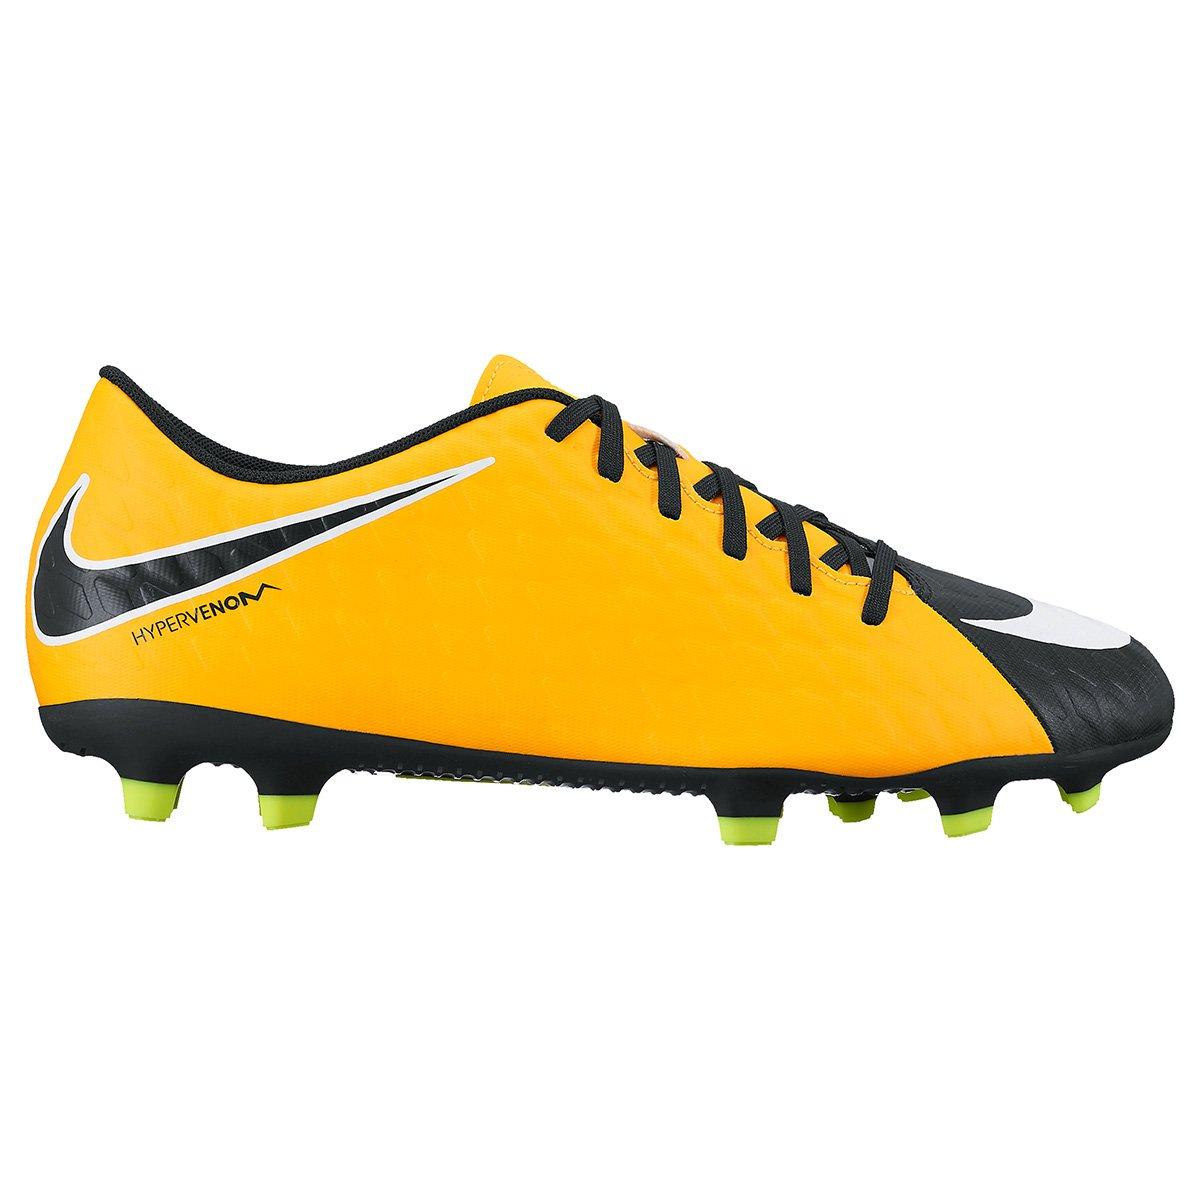 f52bc4ae96 Chuteira Campo Nike Hypervenom Phade 3 FG